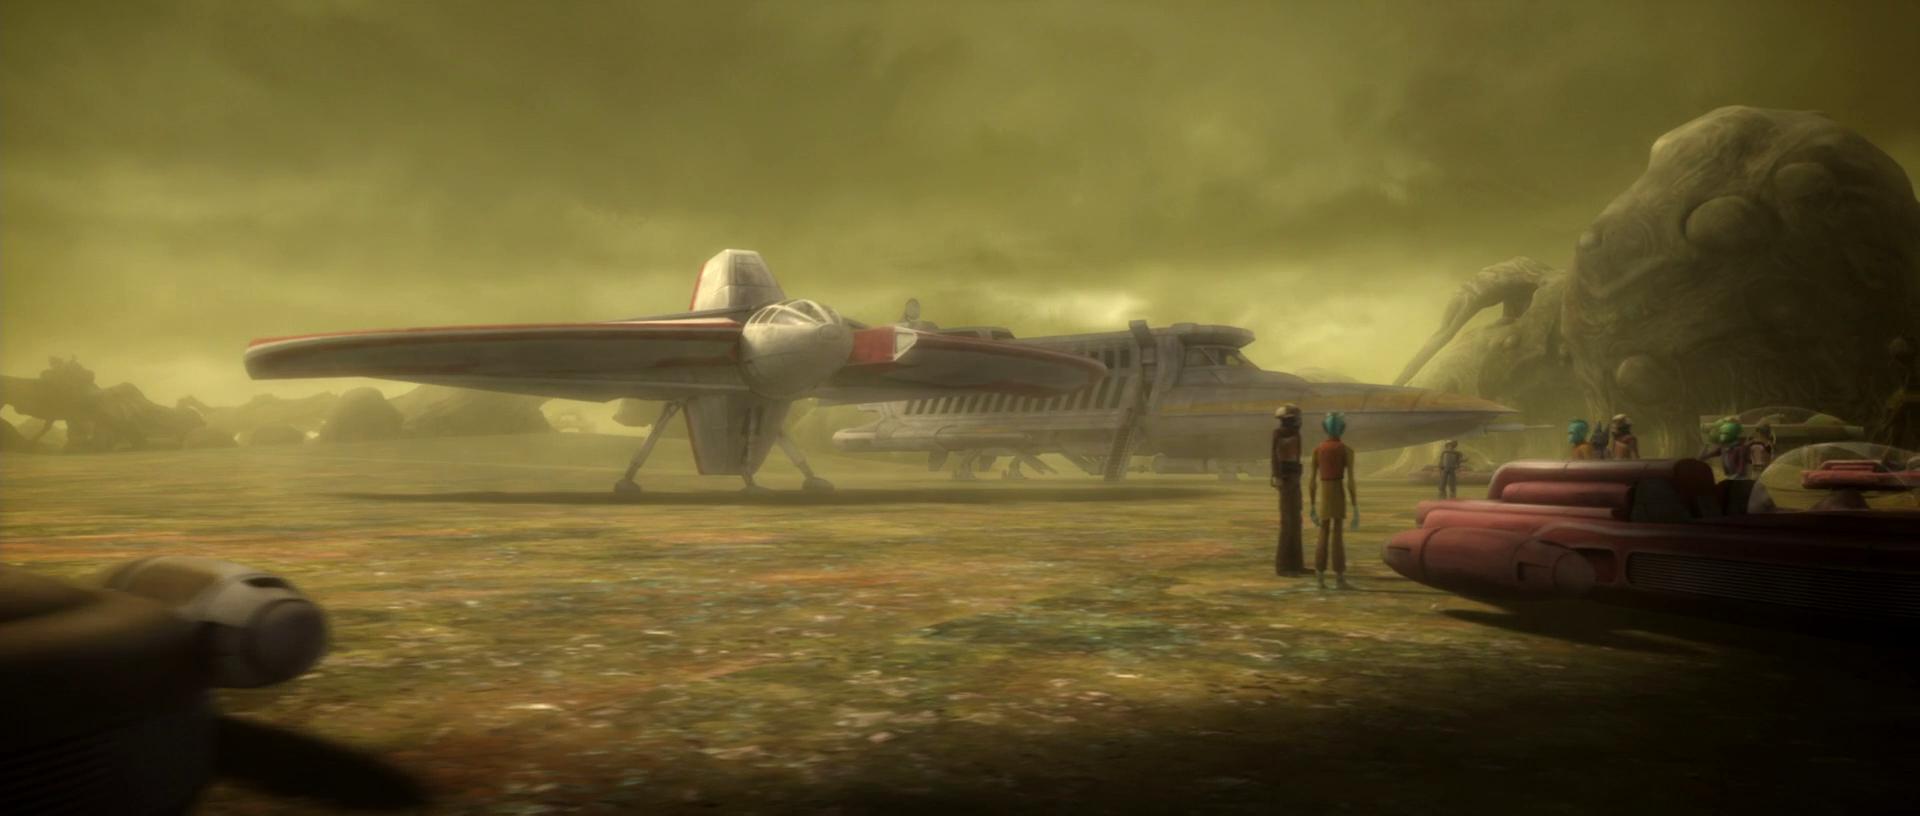 Bilbousa Spaceport